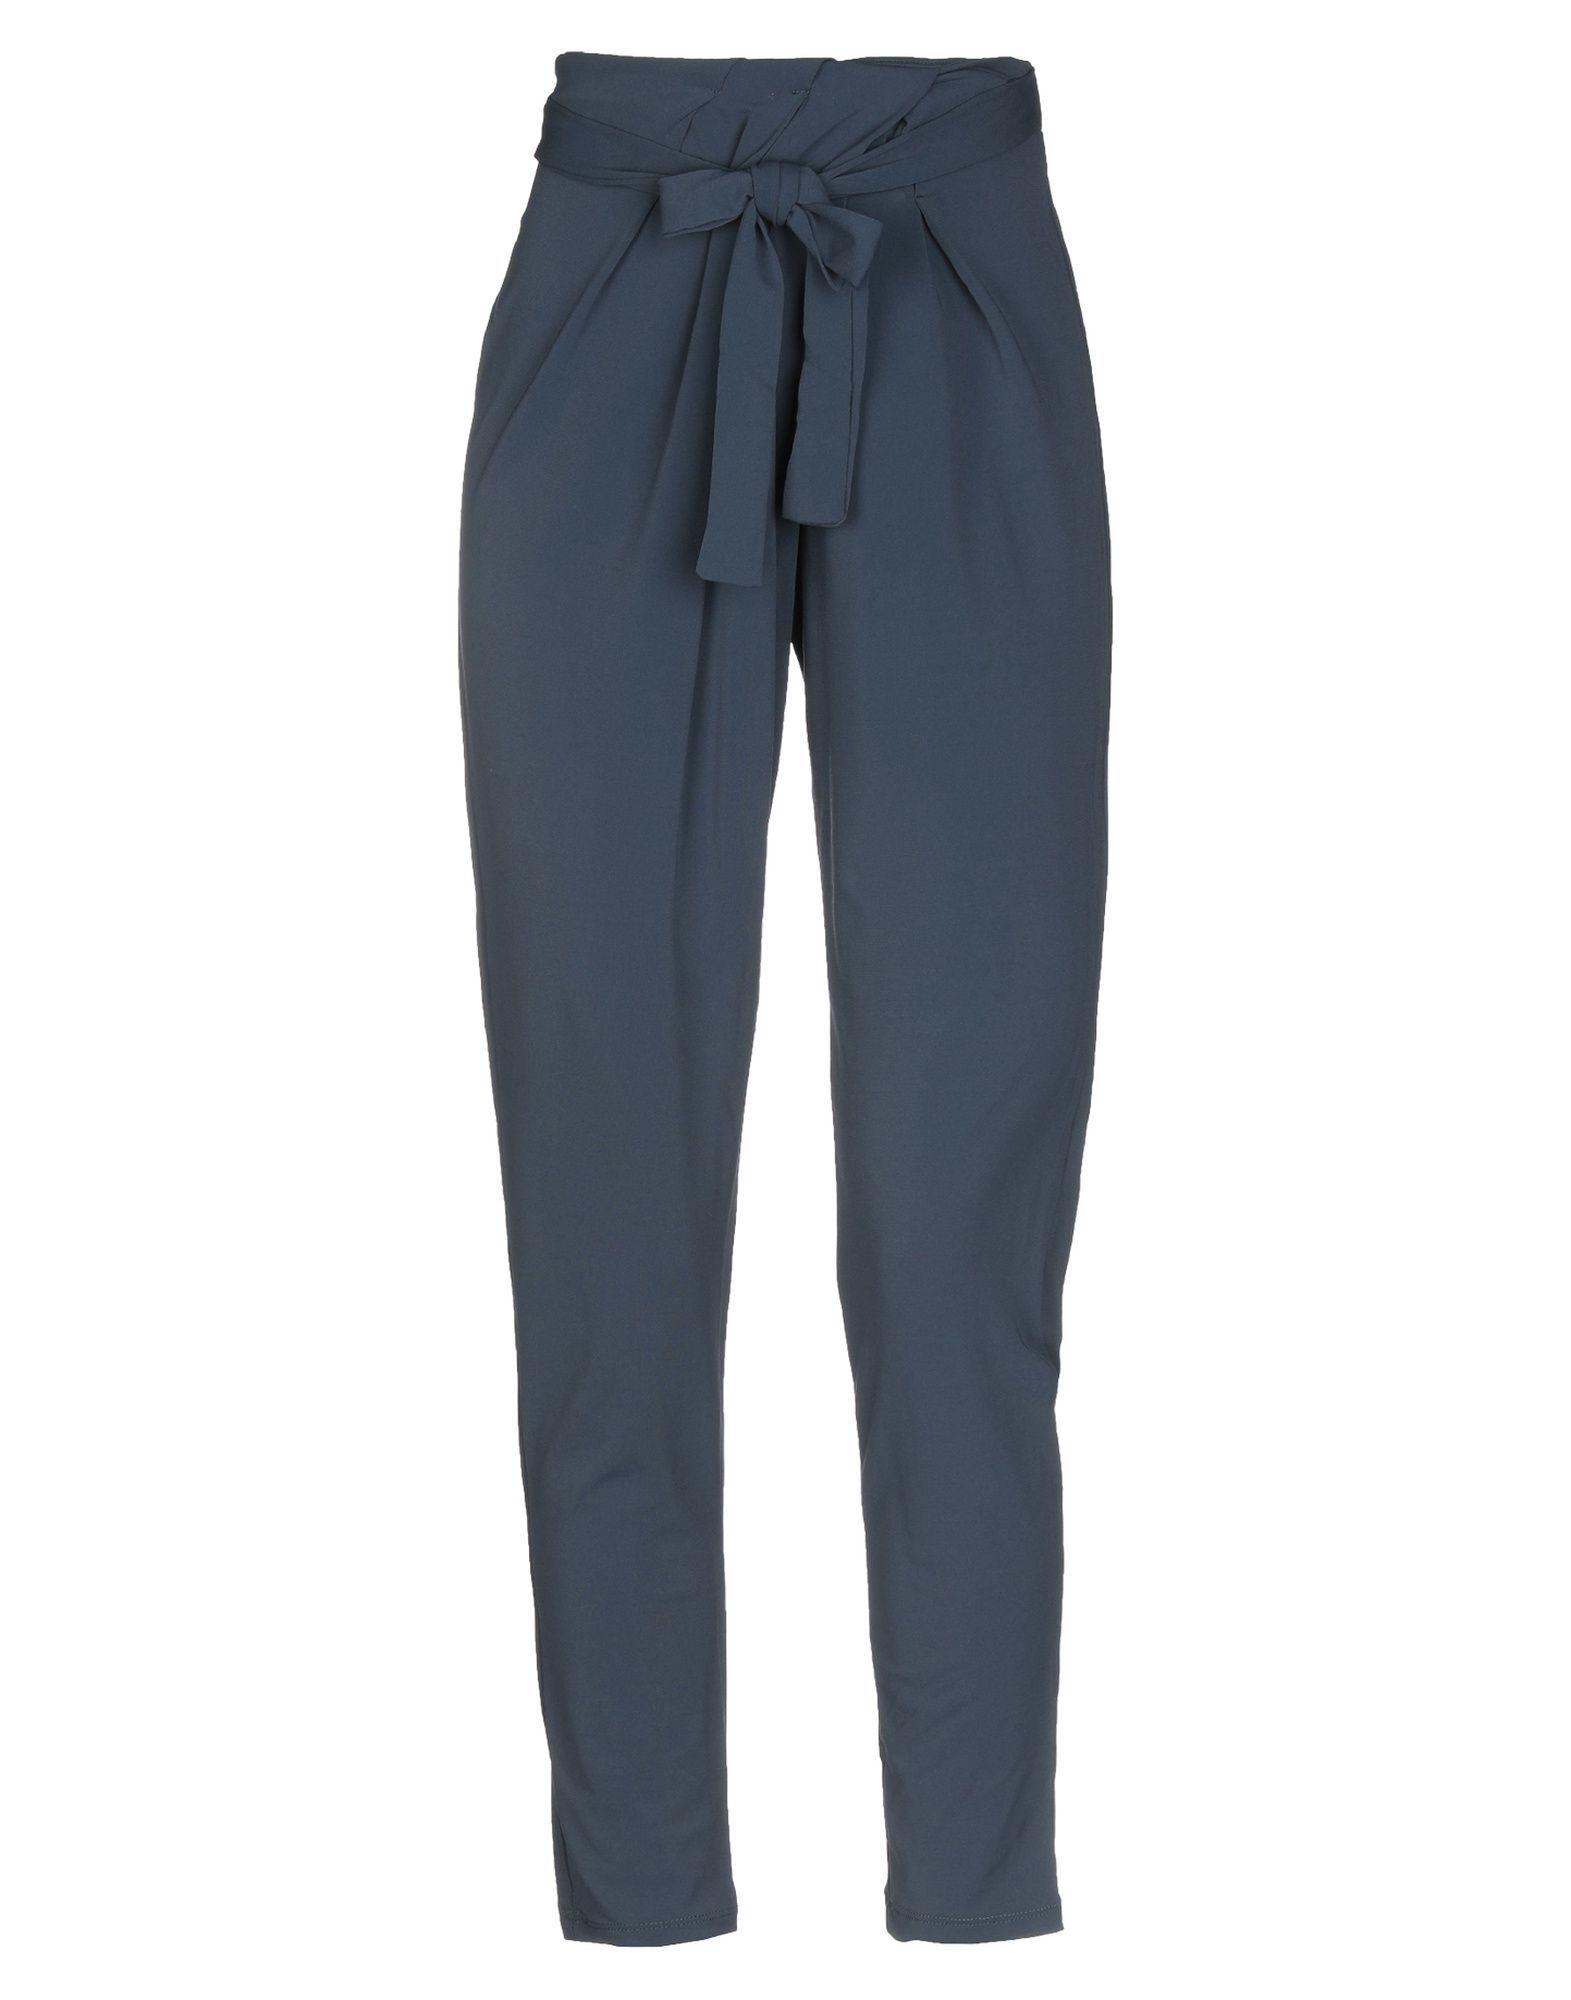 Kaos Slate Blue Crepe Tapered Trousers